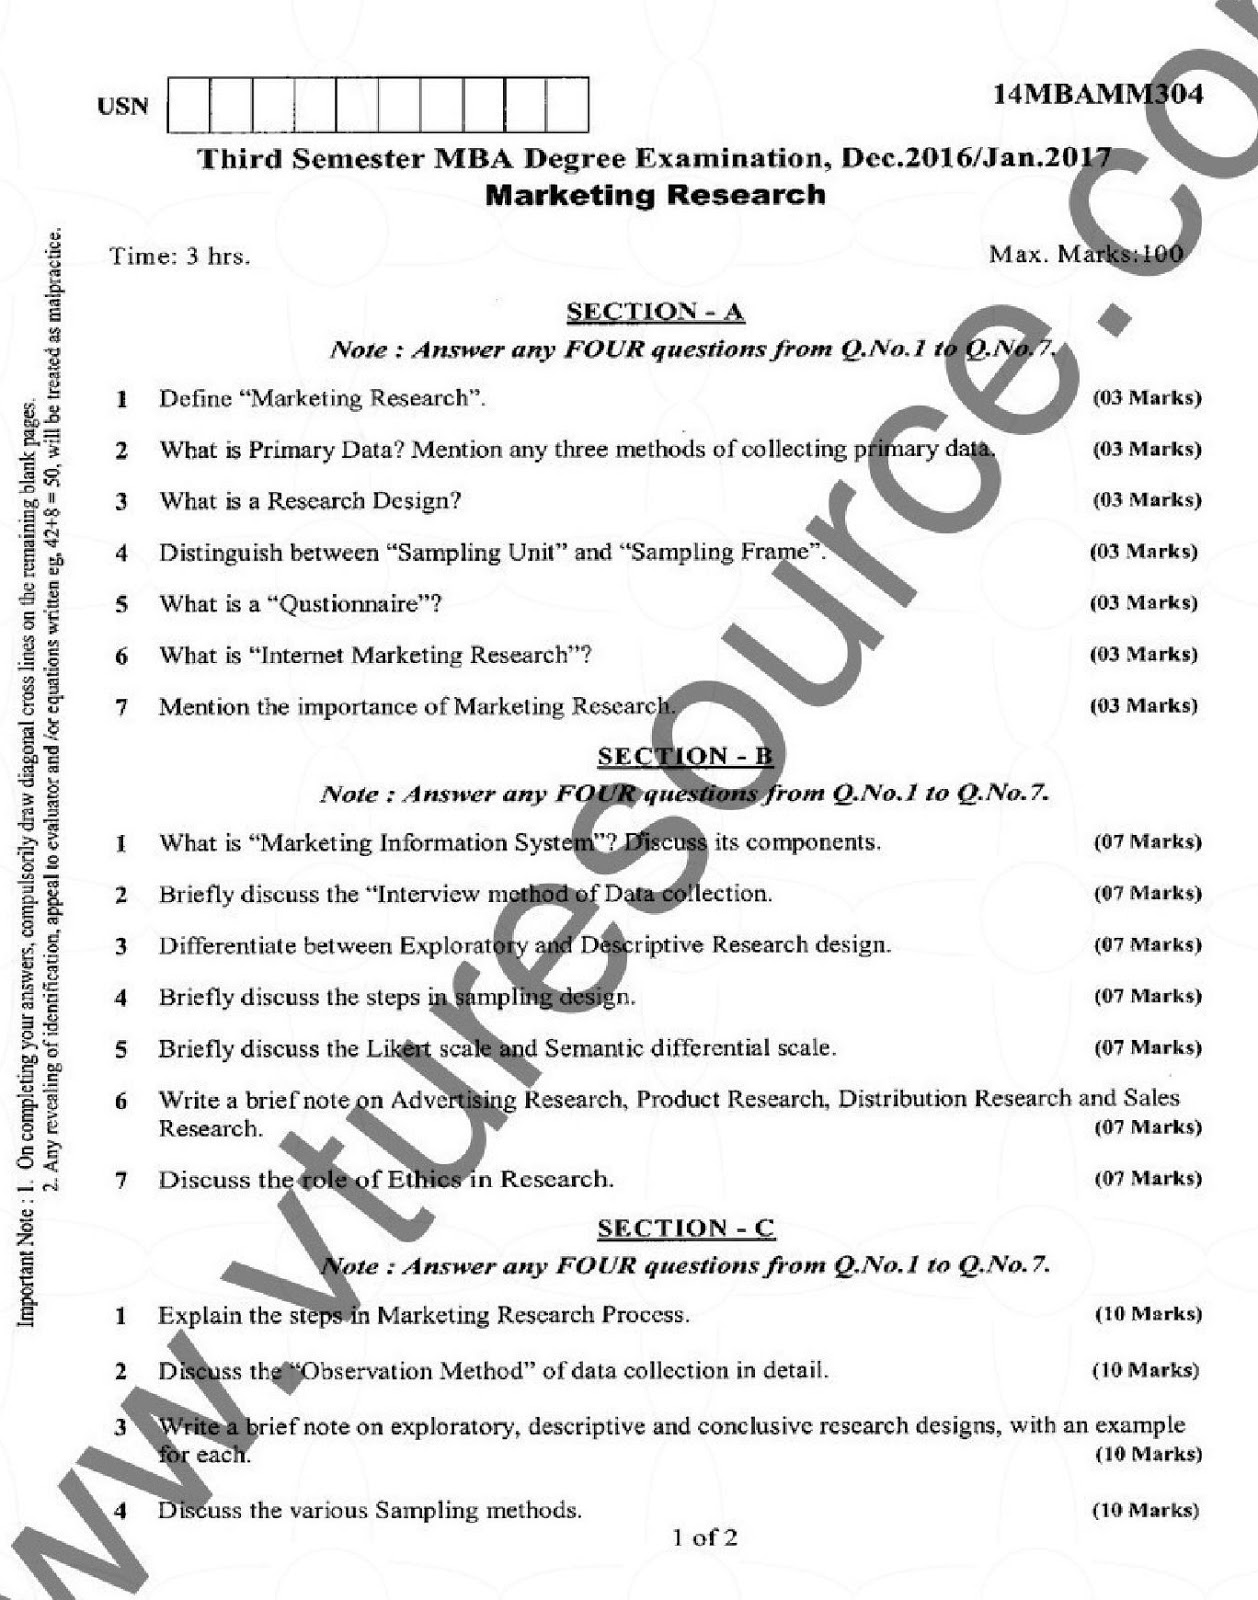 VTU Question Paper – Page 2 – VTU Syllabus